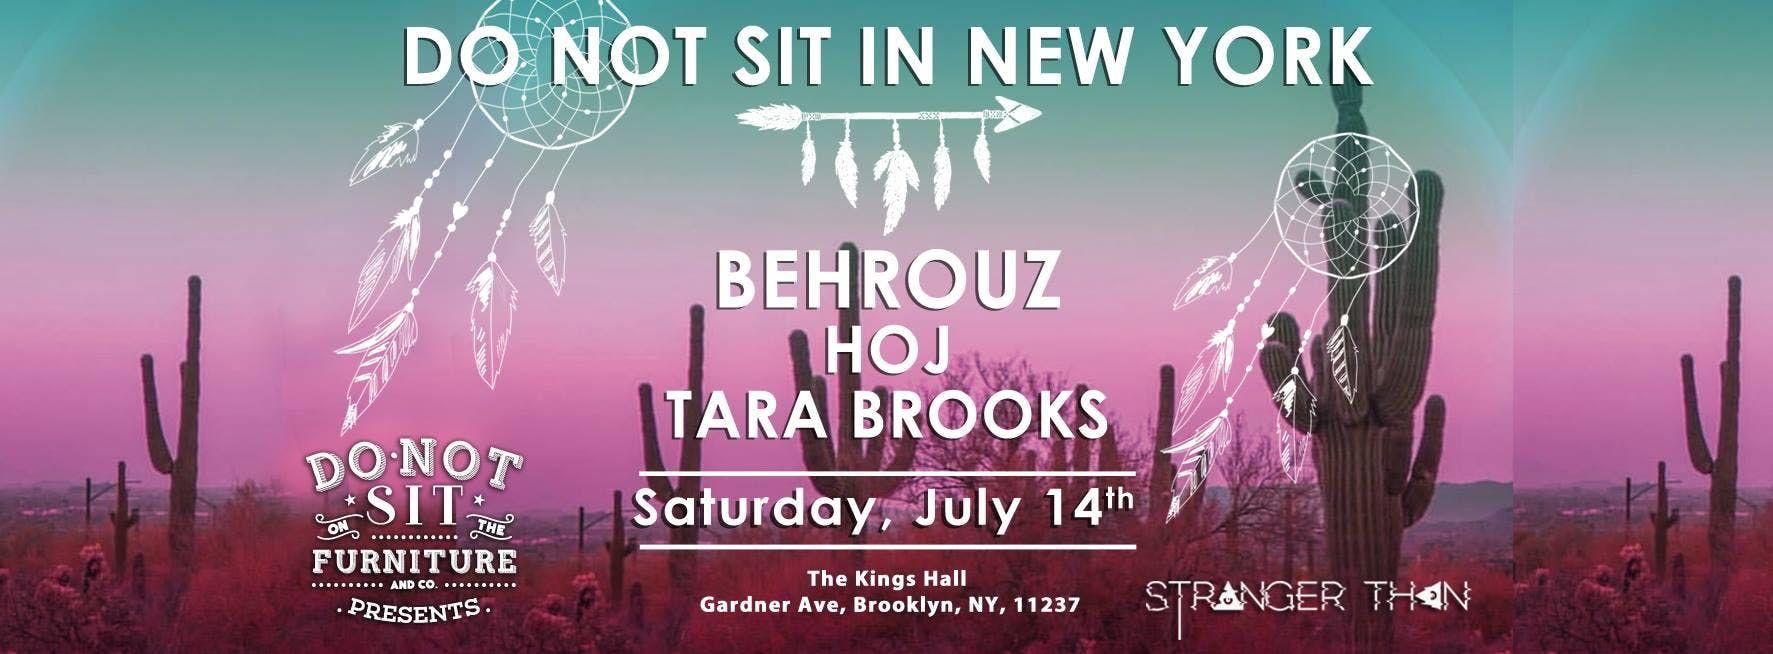 DO NOT SIT IN NY